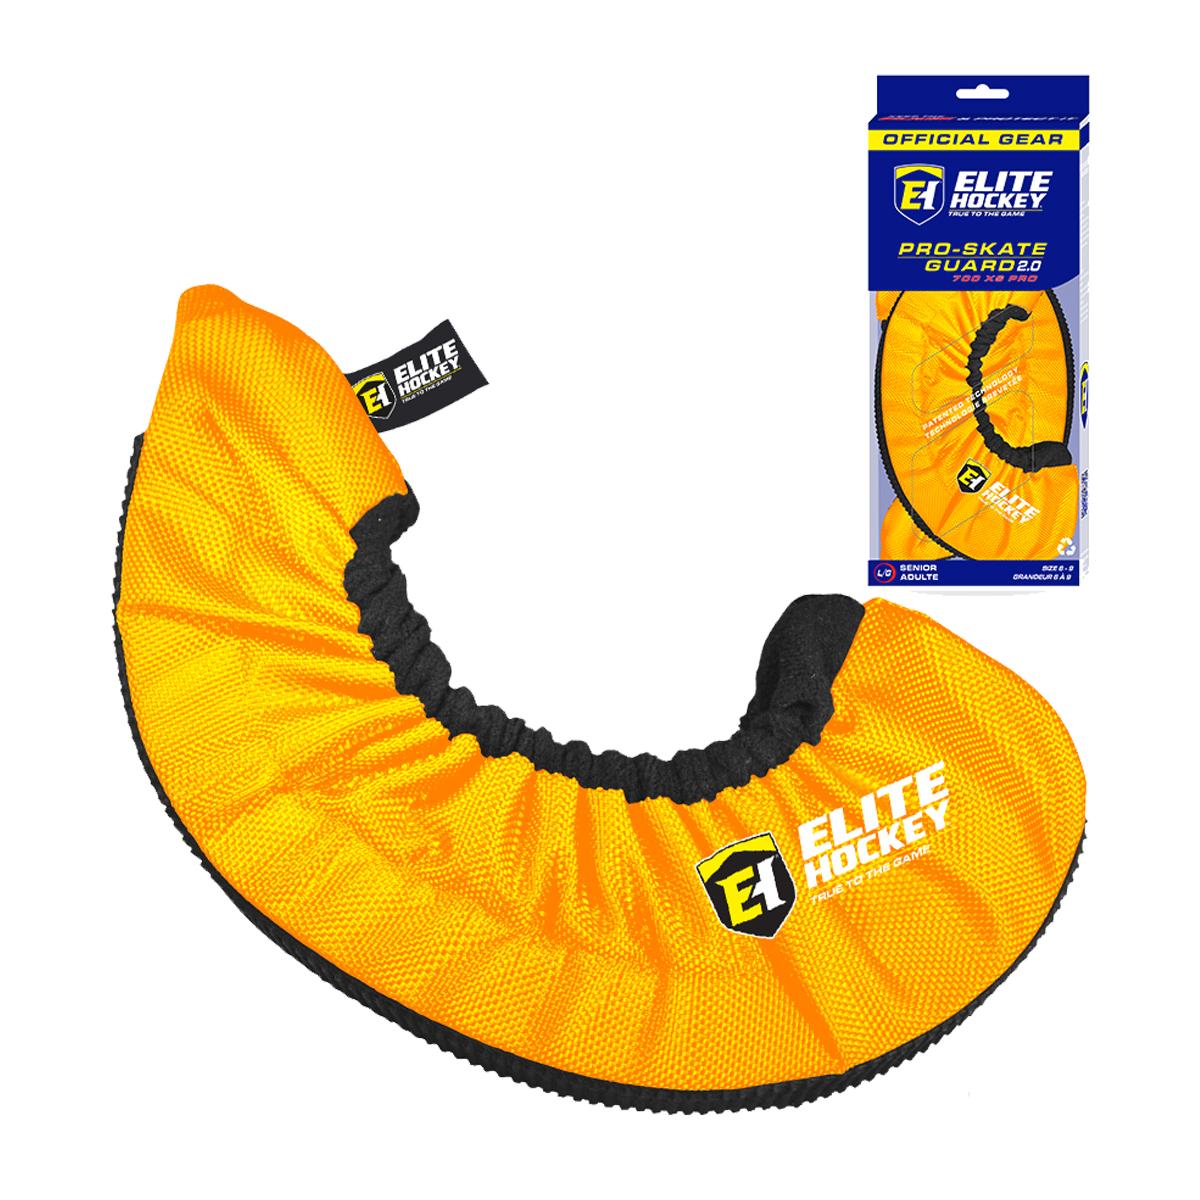 Elite Hockey 700XS Pro Hockey Skate Guards NEW Yellow